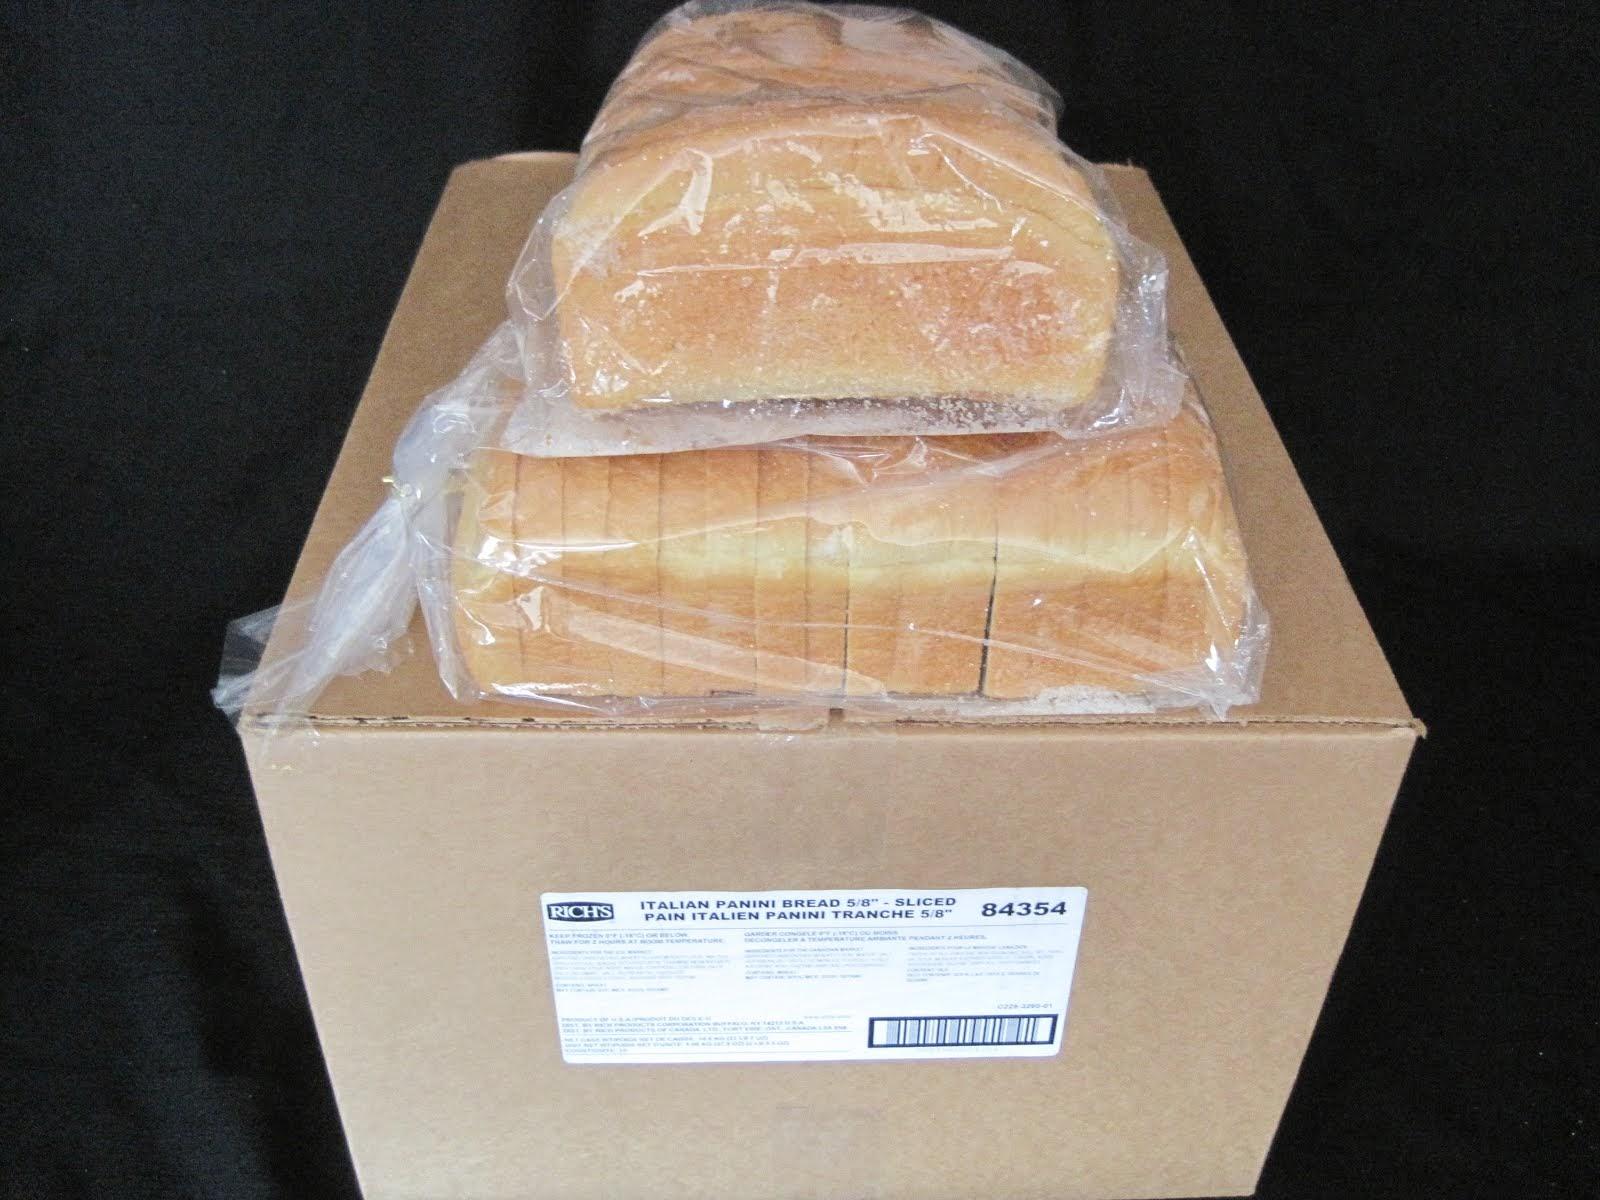 Panini Bread Sliced 10/37 oz Loafs - Item # 29255